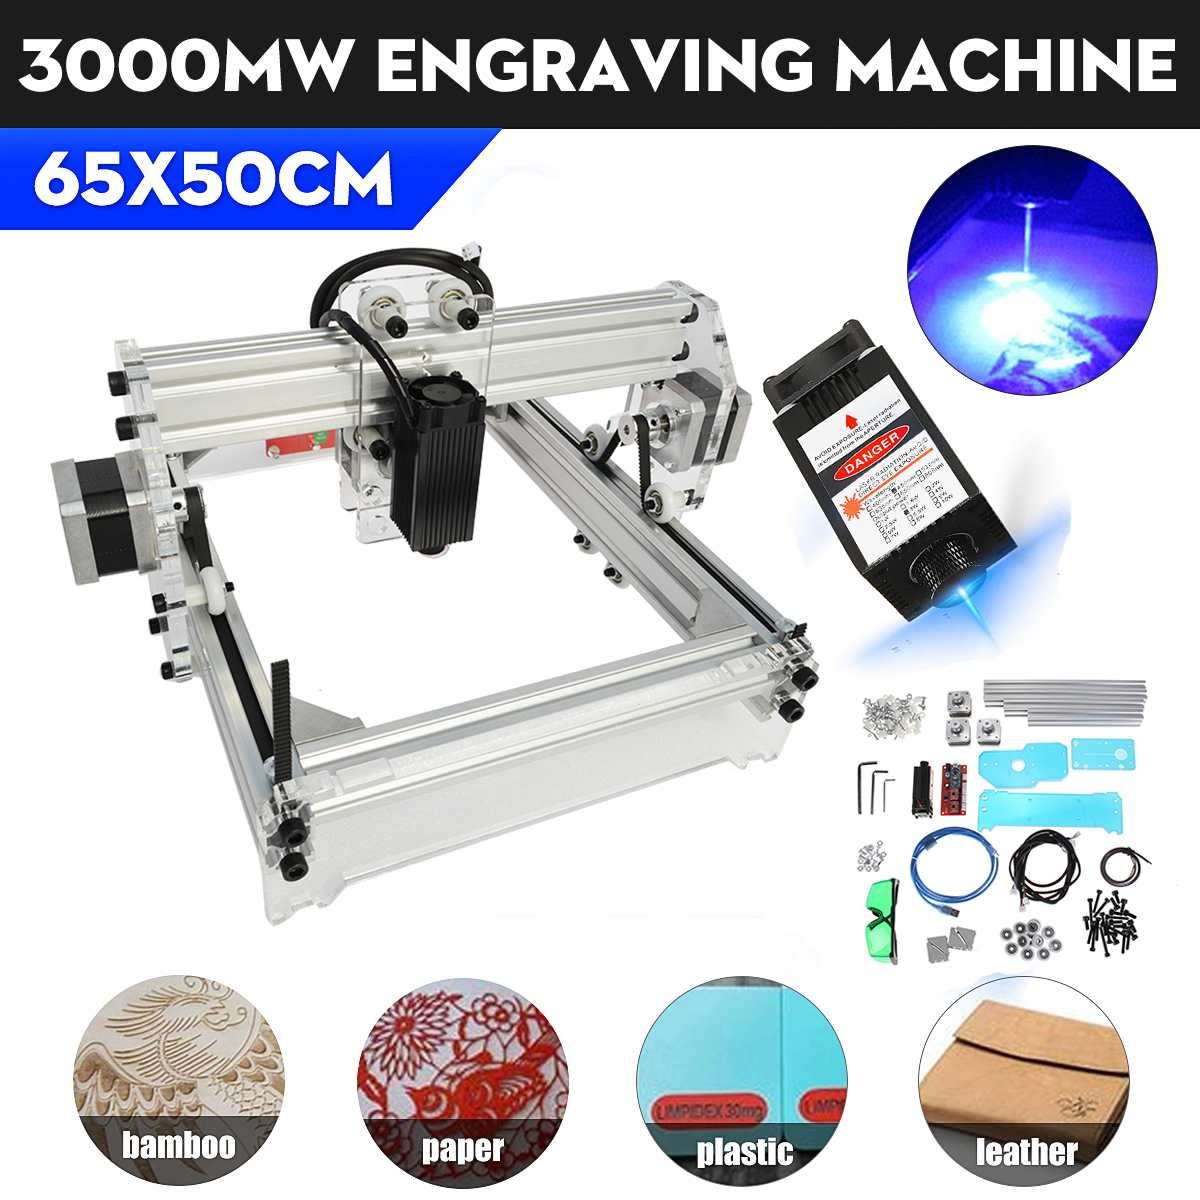 50*65cm USB 3000MW Engraving Machine Mini DIY Engraver Machine Desktop Wood Router/Cutter/Printer+ Adjustable Laser DC 12V